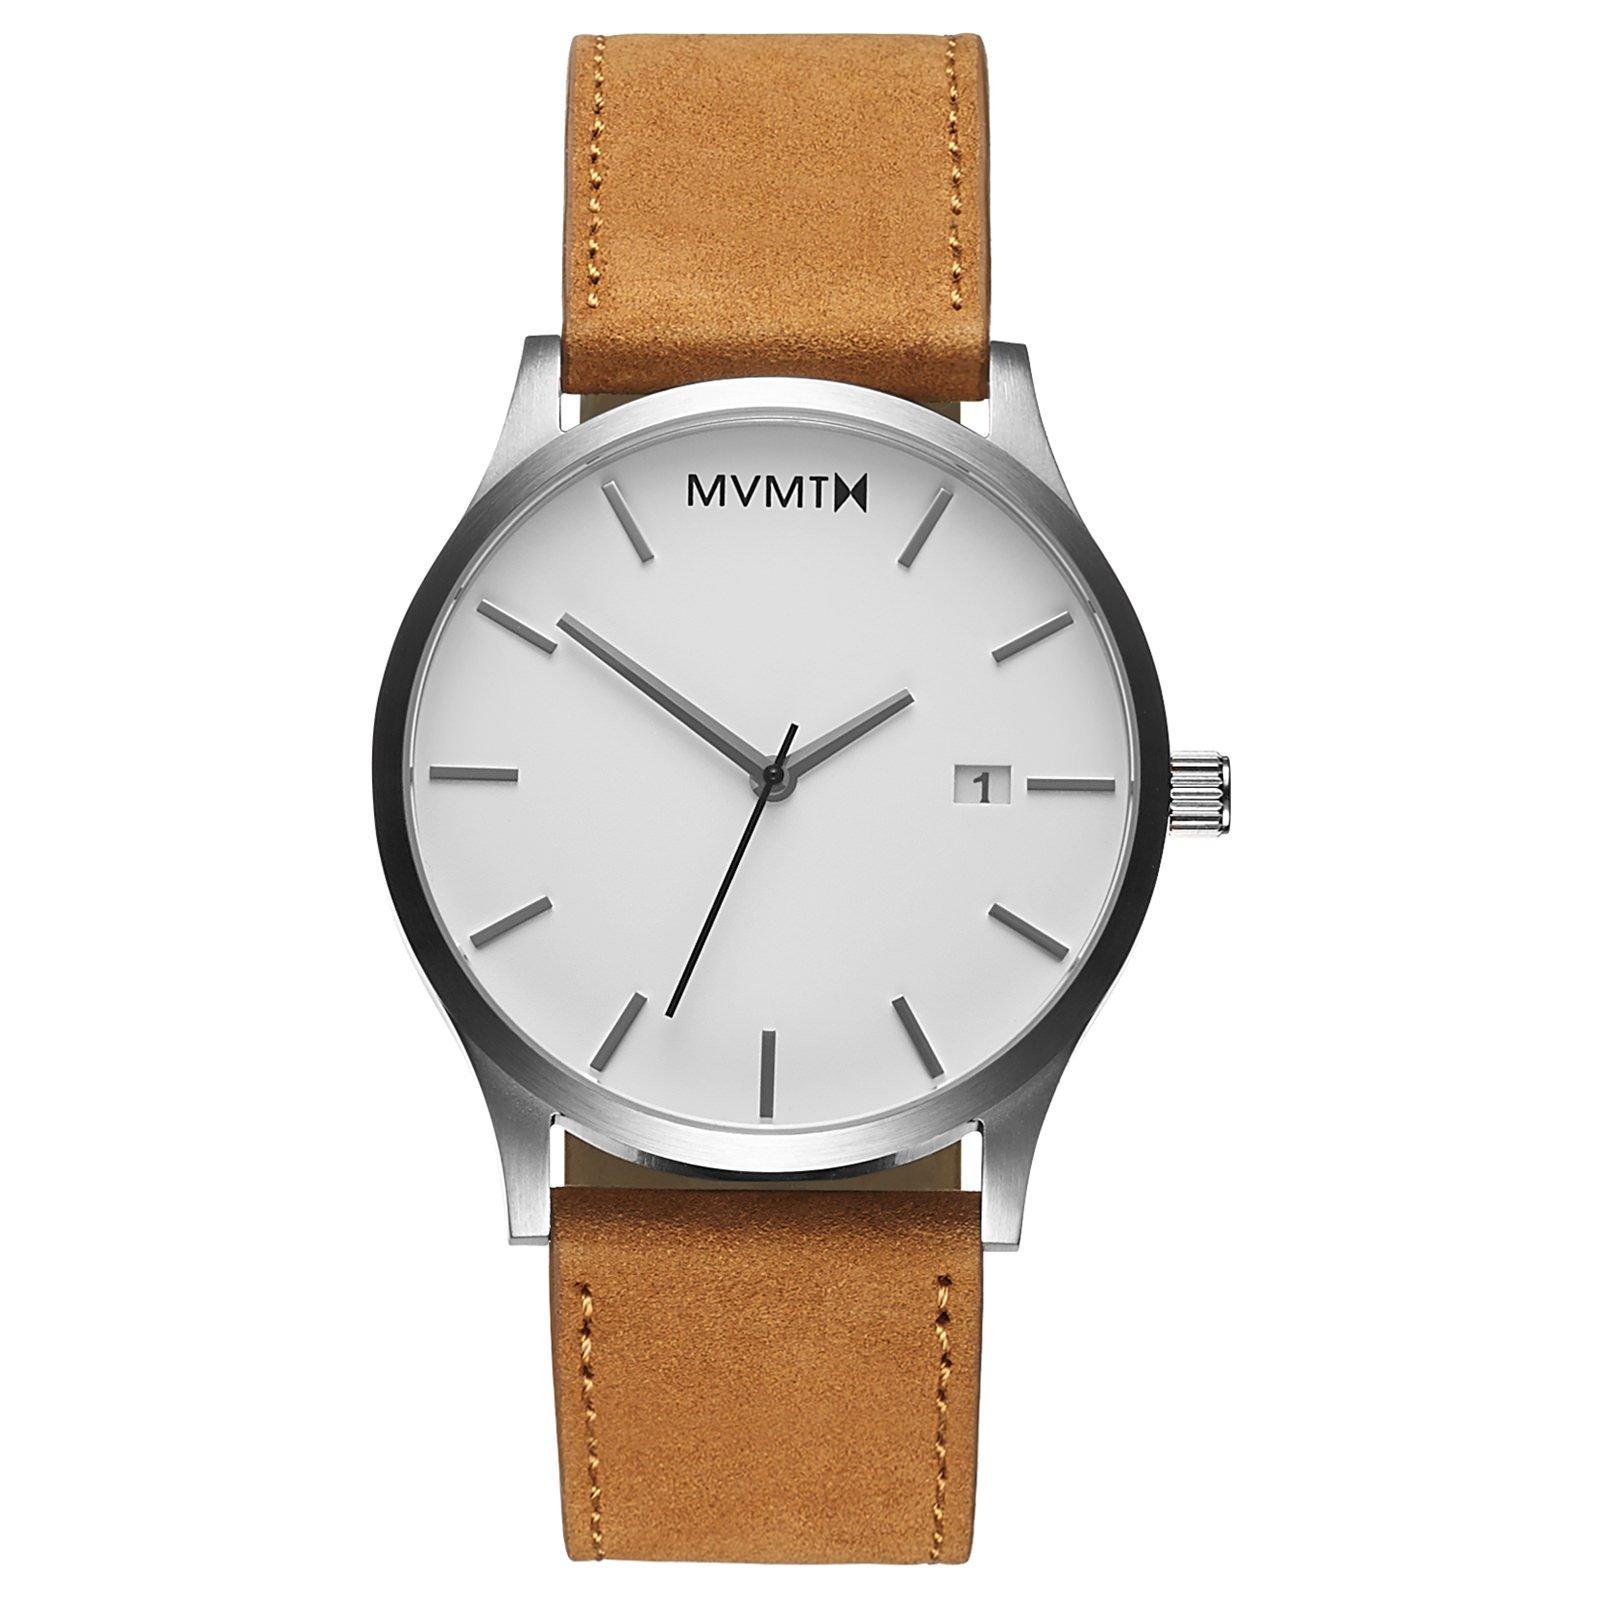 MVMT Classic Watches | 45 MM Men's Analog Minimalist Watch | White Tan